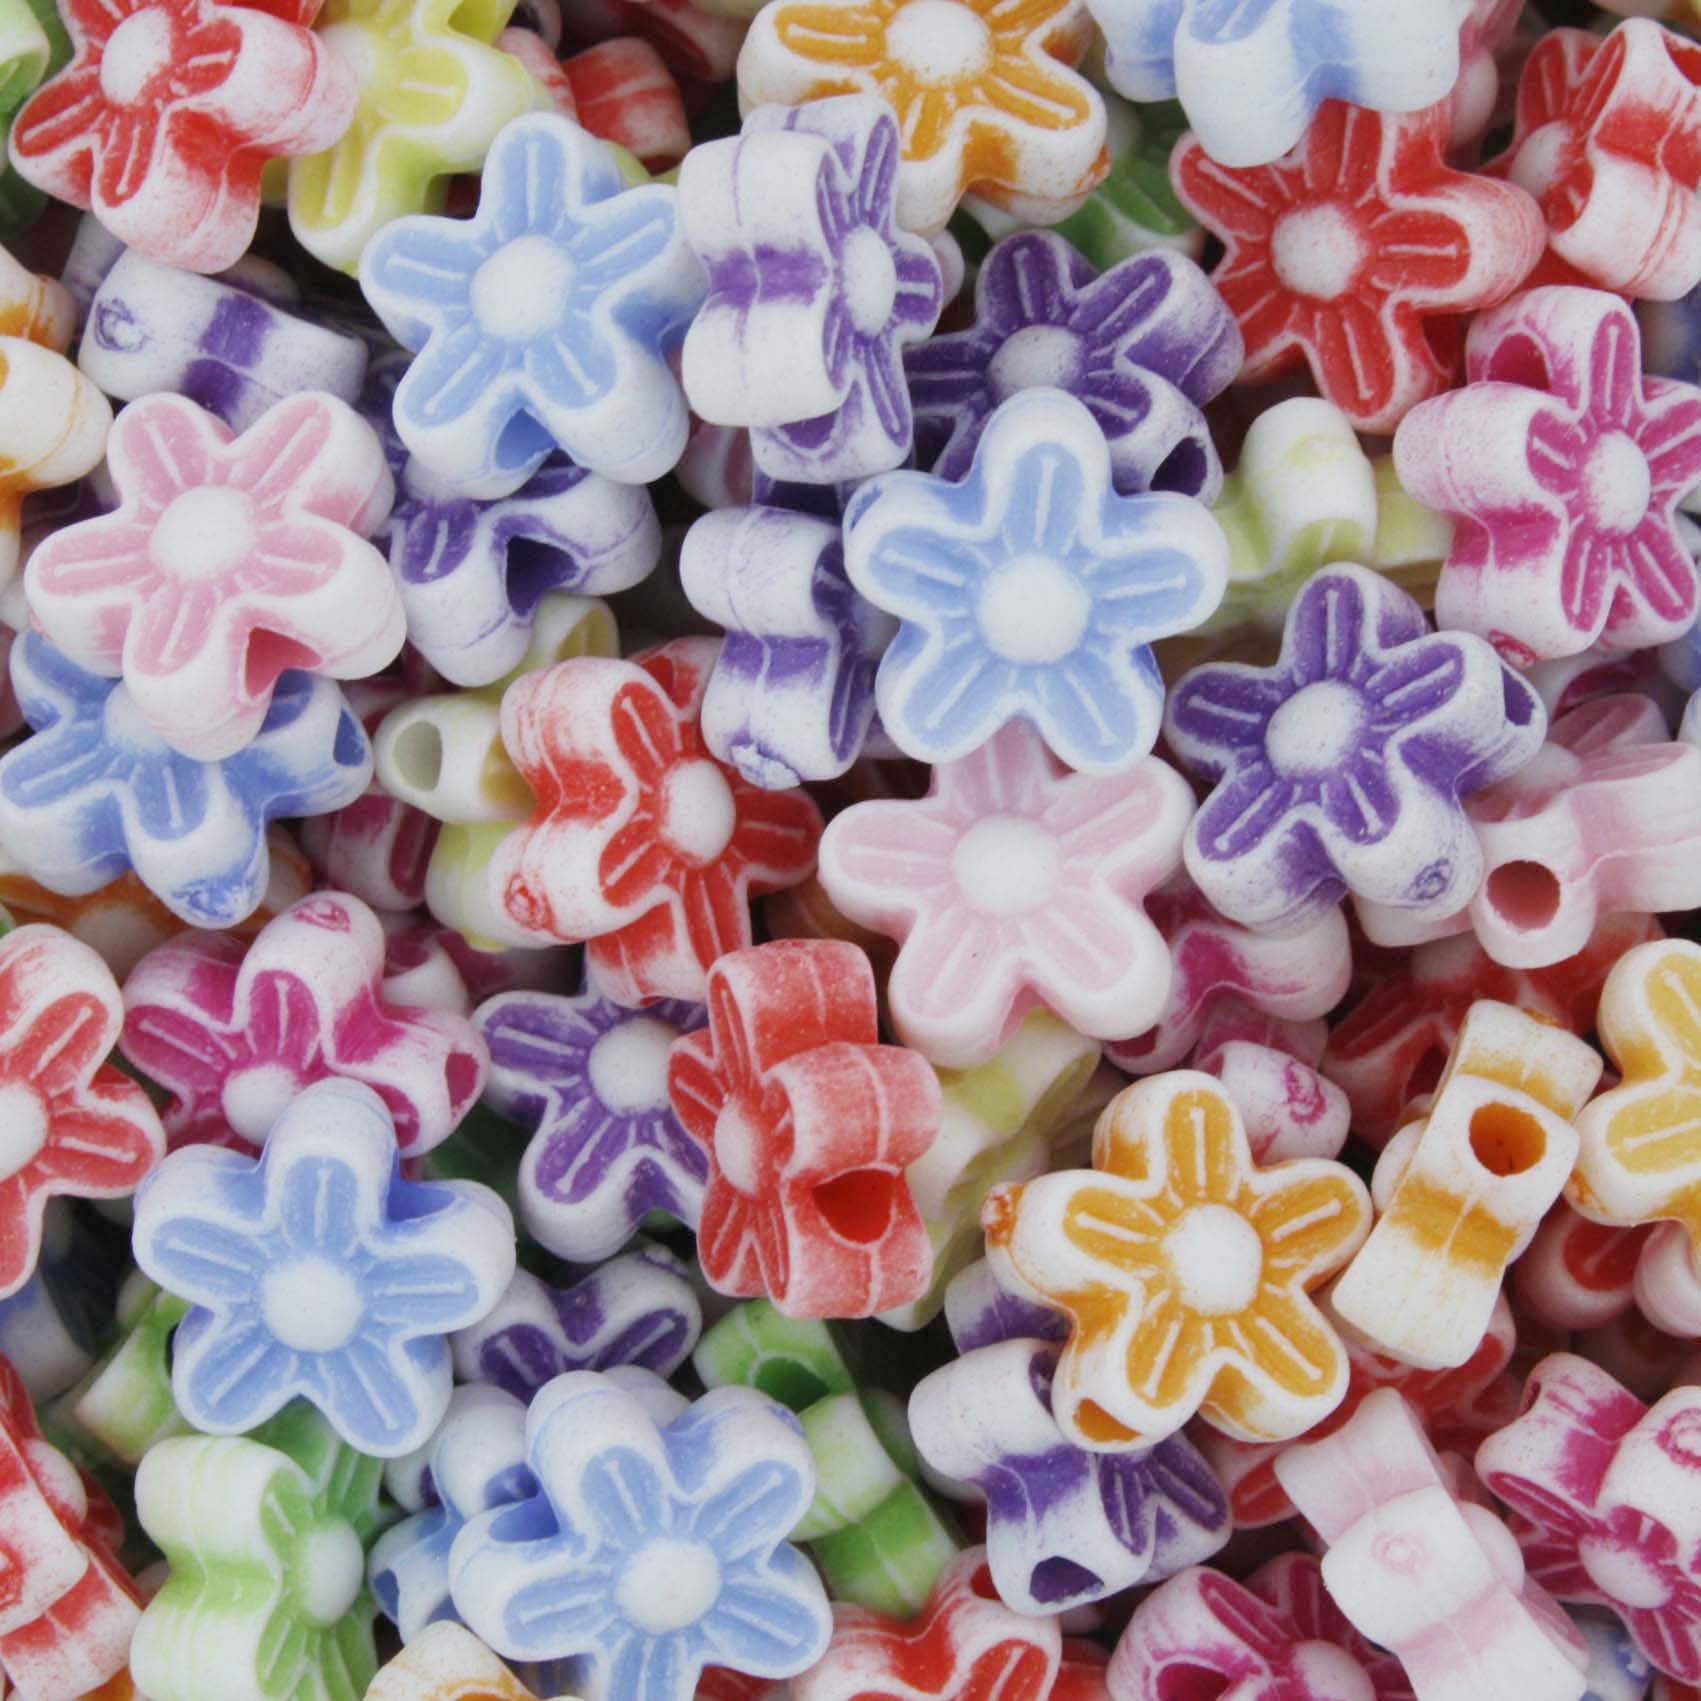 Miçanga Colorida / Infantil - Flor  - Stéphanie Bijoux® - Peças para Bijuterias e Artesanato